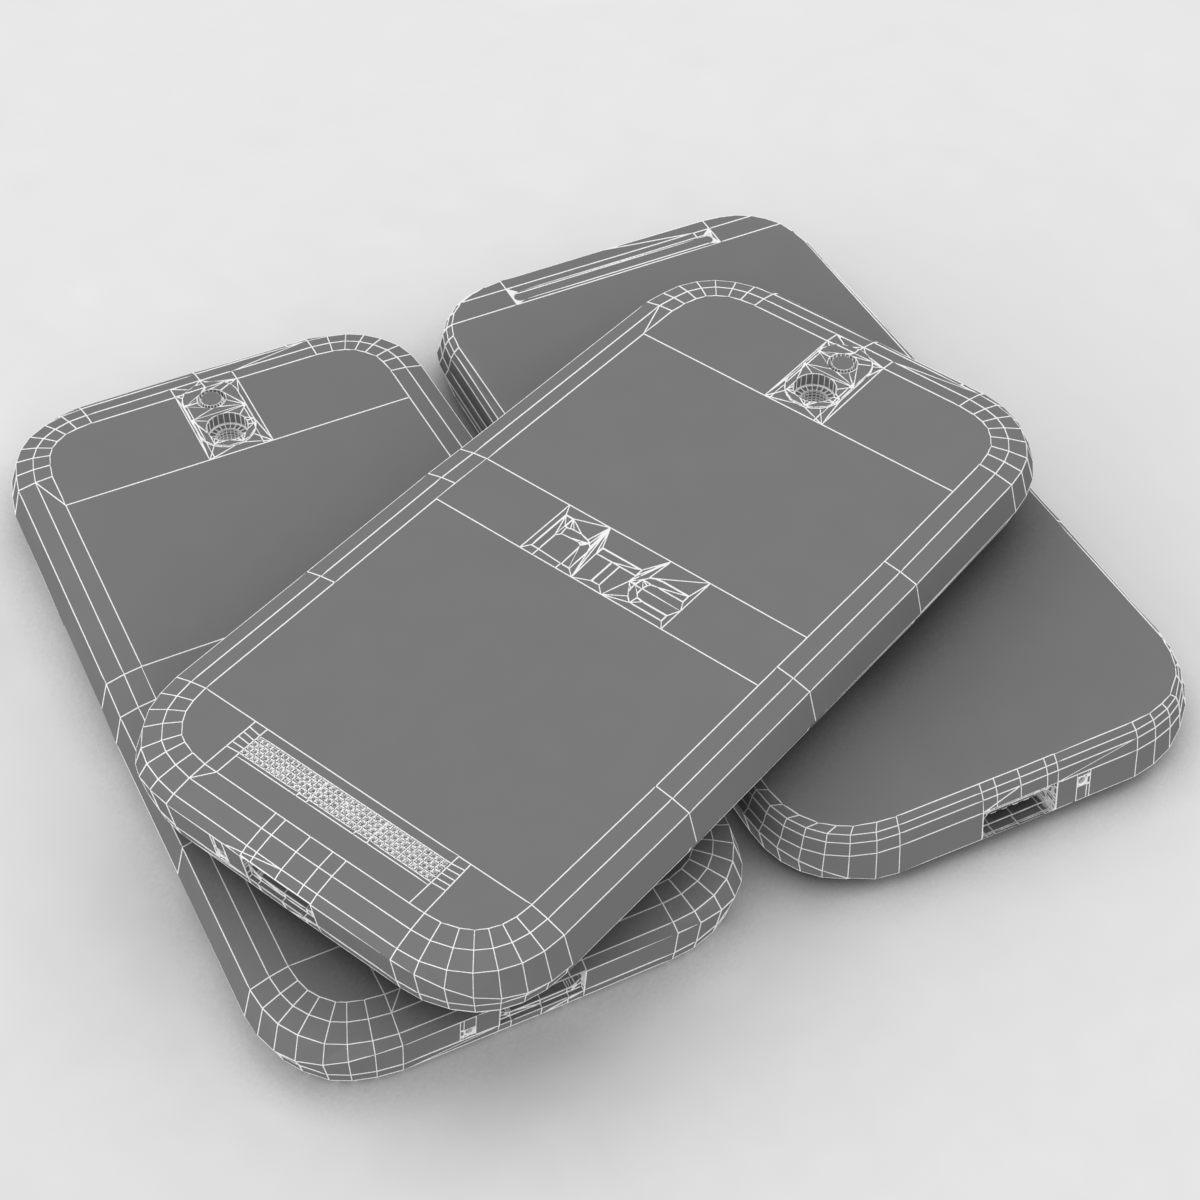 htc desire sv – lowpoly 3d model 3ds max fbx ma mb obj 154256